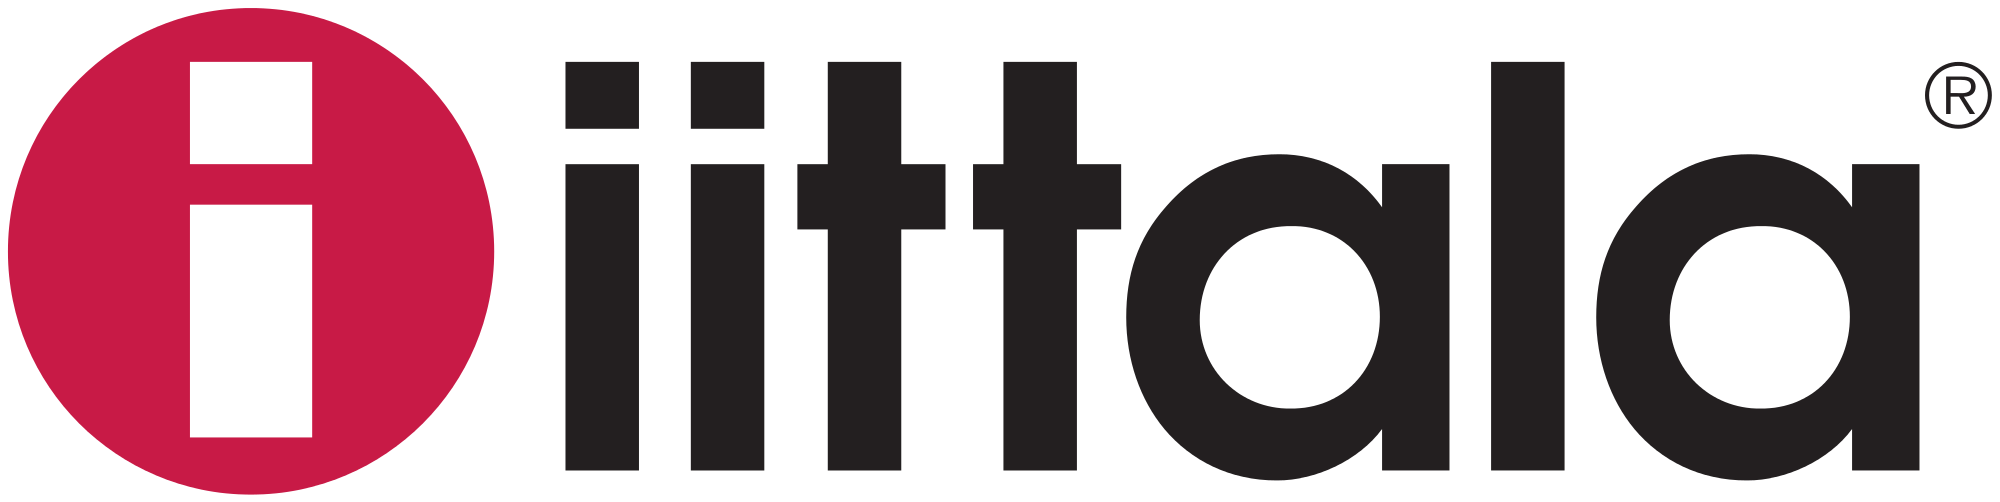 Littala_Logo.png